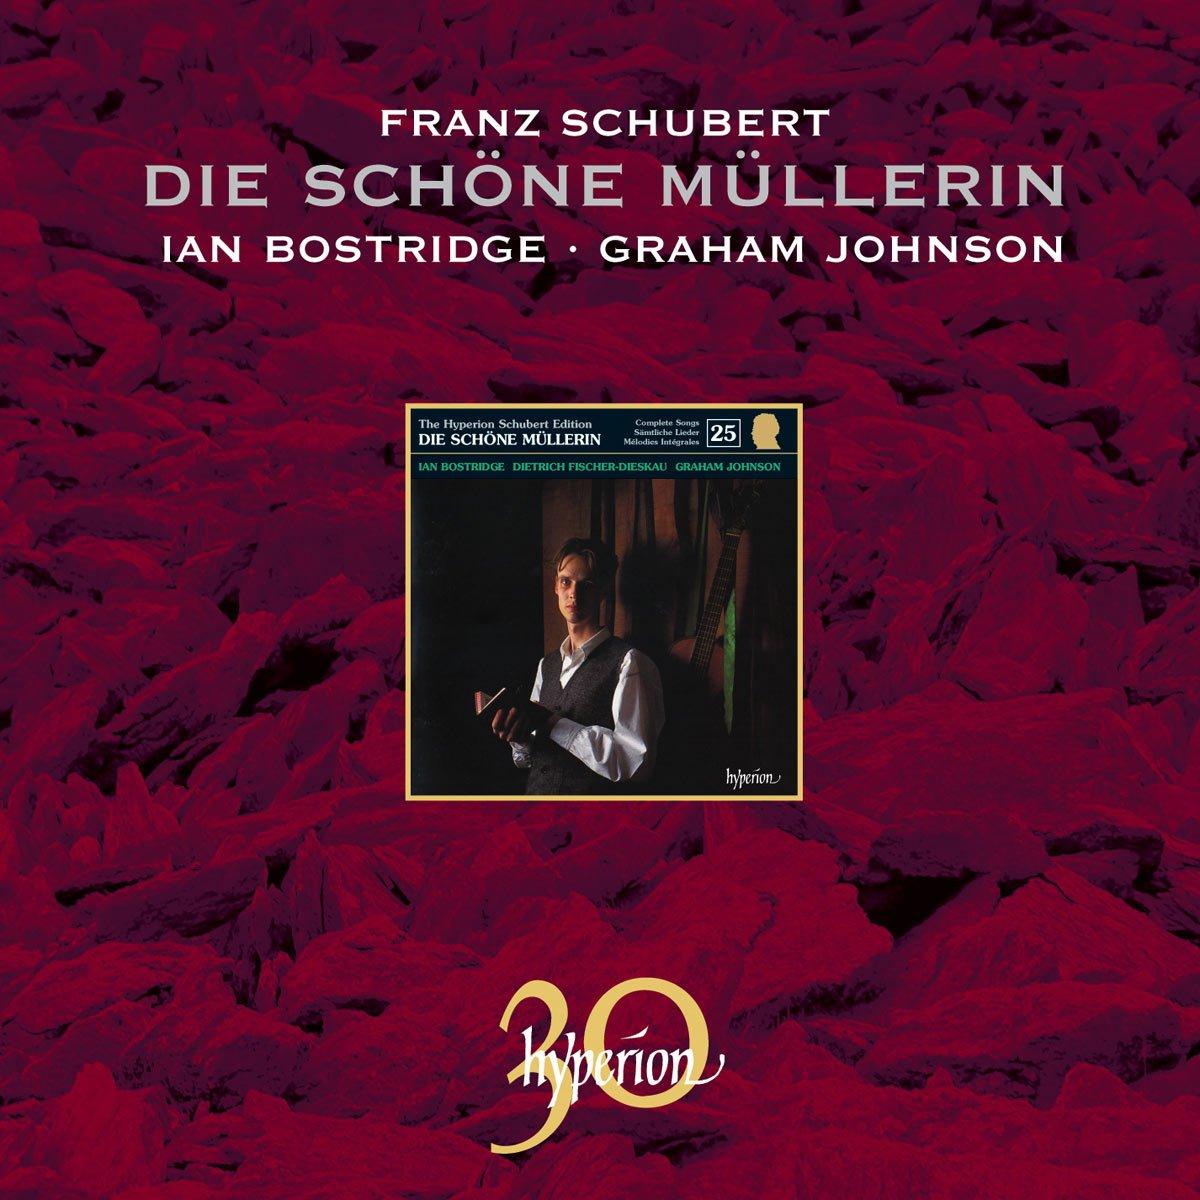 Die schöne Müllerin, No. 16 -  The Favorite Color, Op. 25, D795